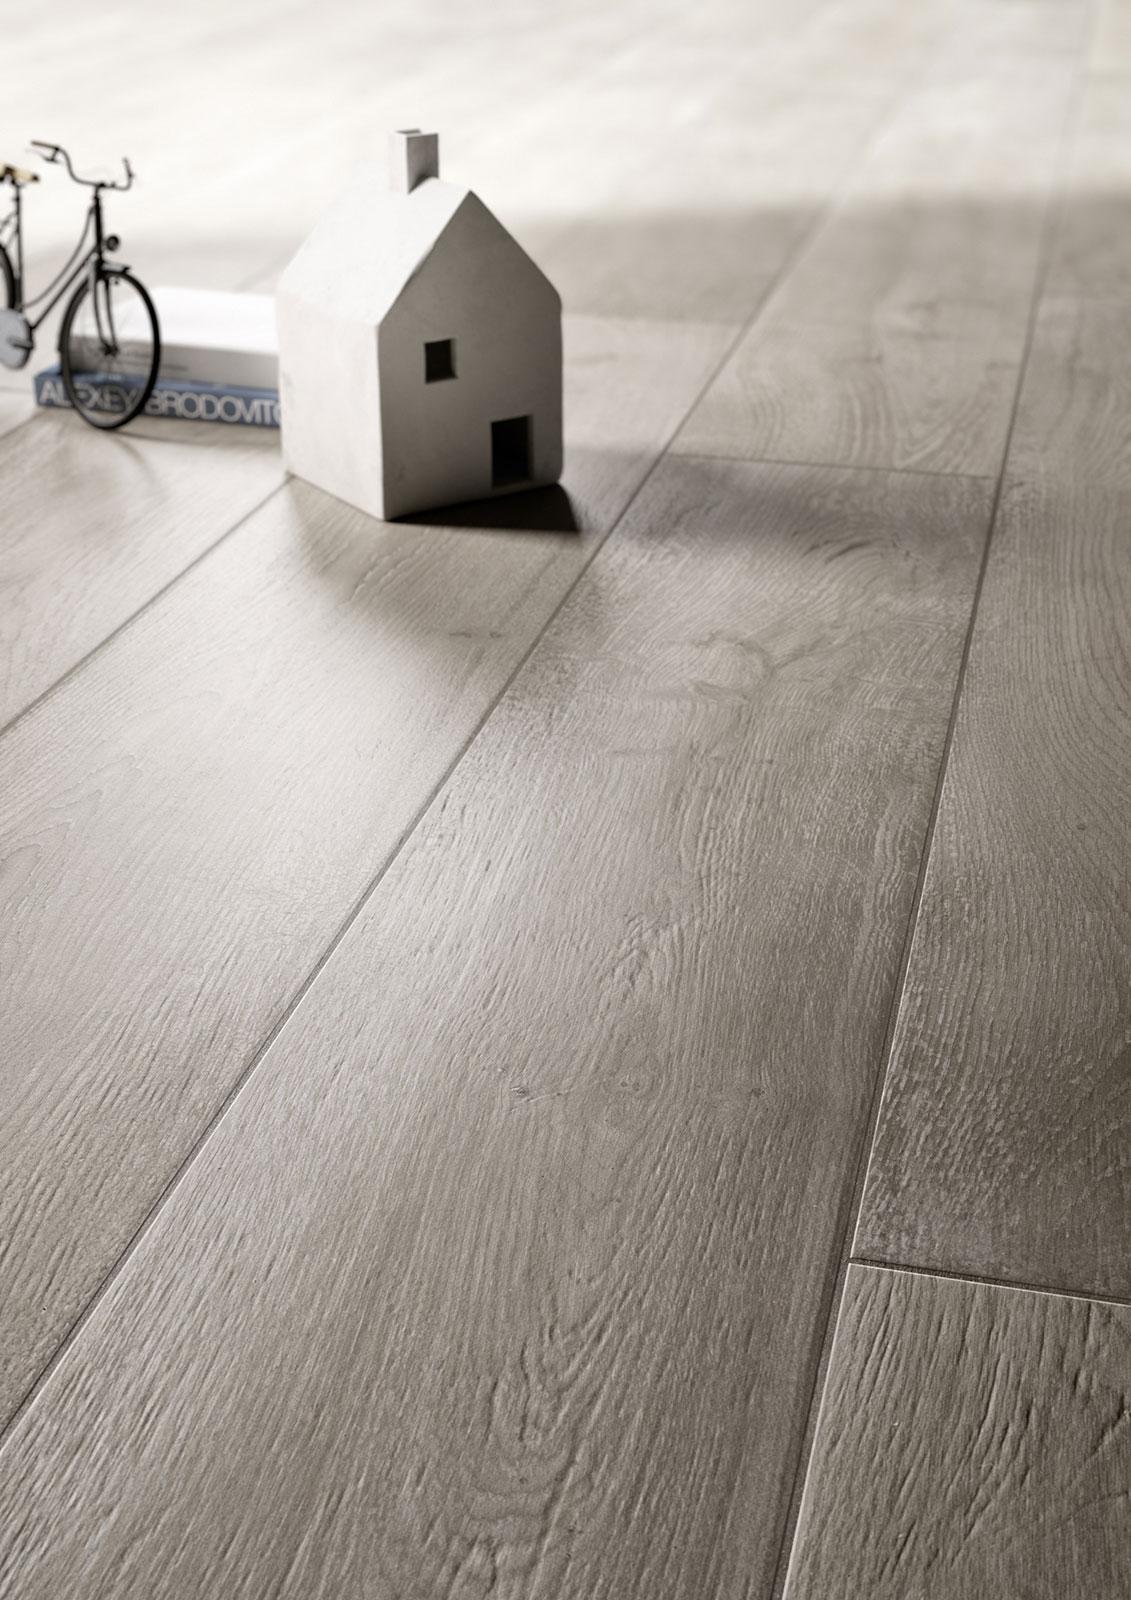 Treverktime gres pavimento effetto legno marazzi - Piastrelle ceramica tipo parquet ...